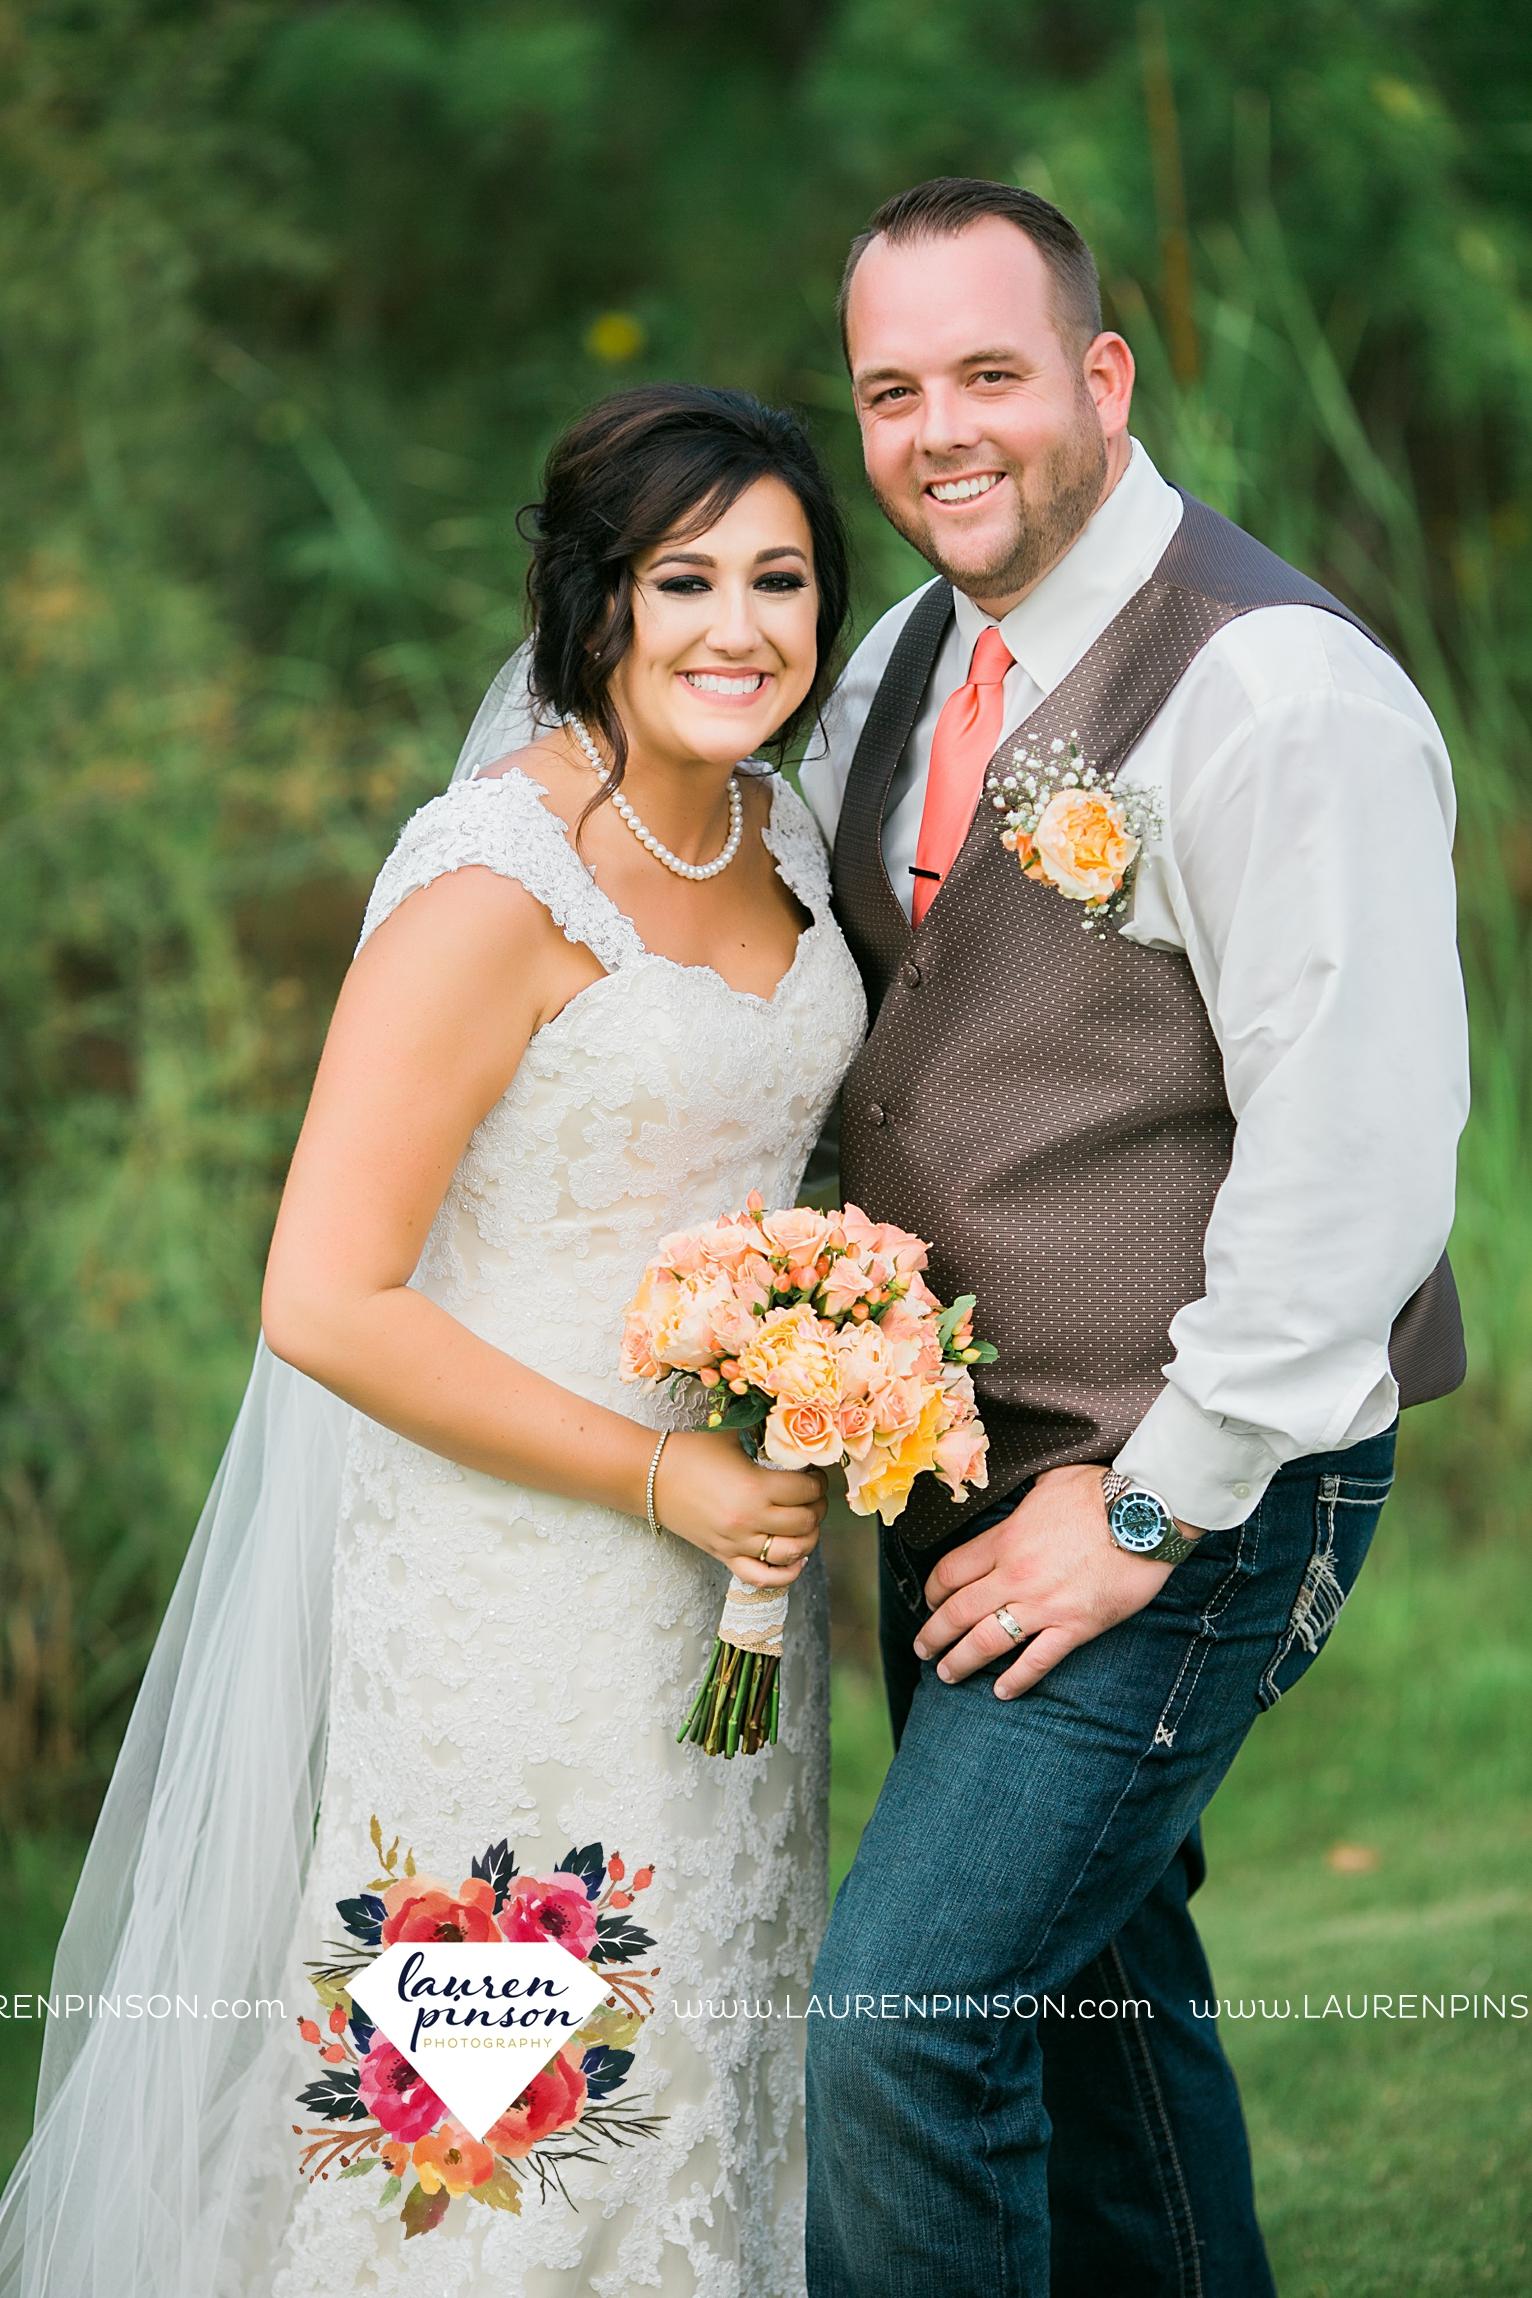 wichita-falls-texas-wedding-photographer-wellington-on-the-lake-with-mayfield-events_2978.jpg